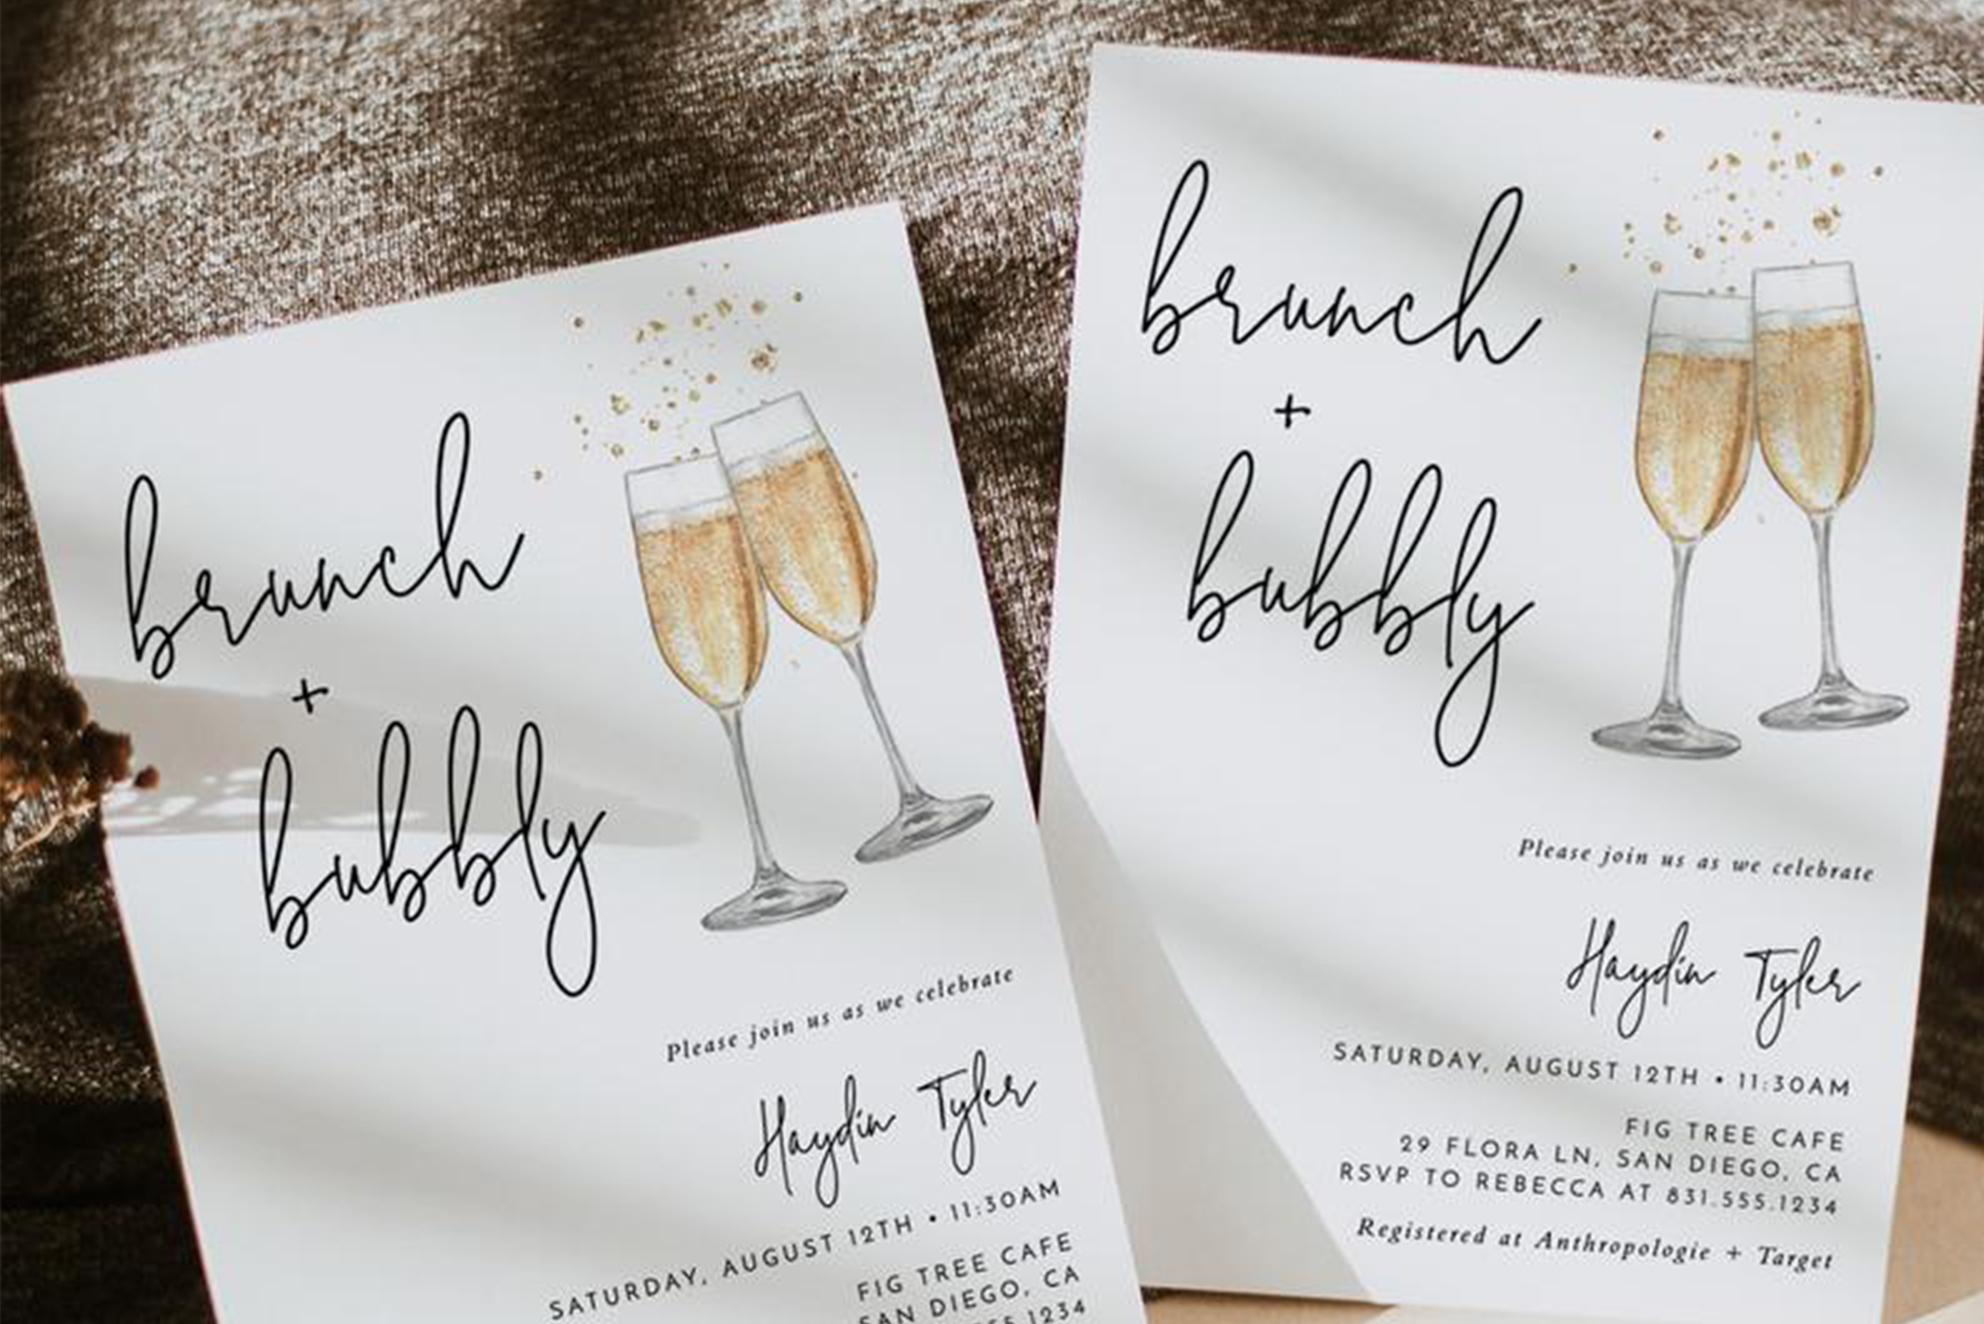 convite casamento brunch